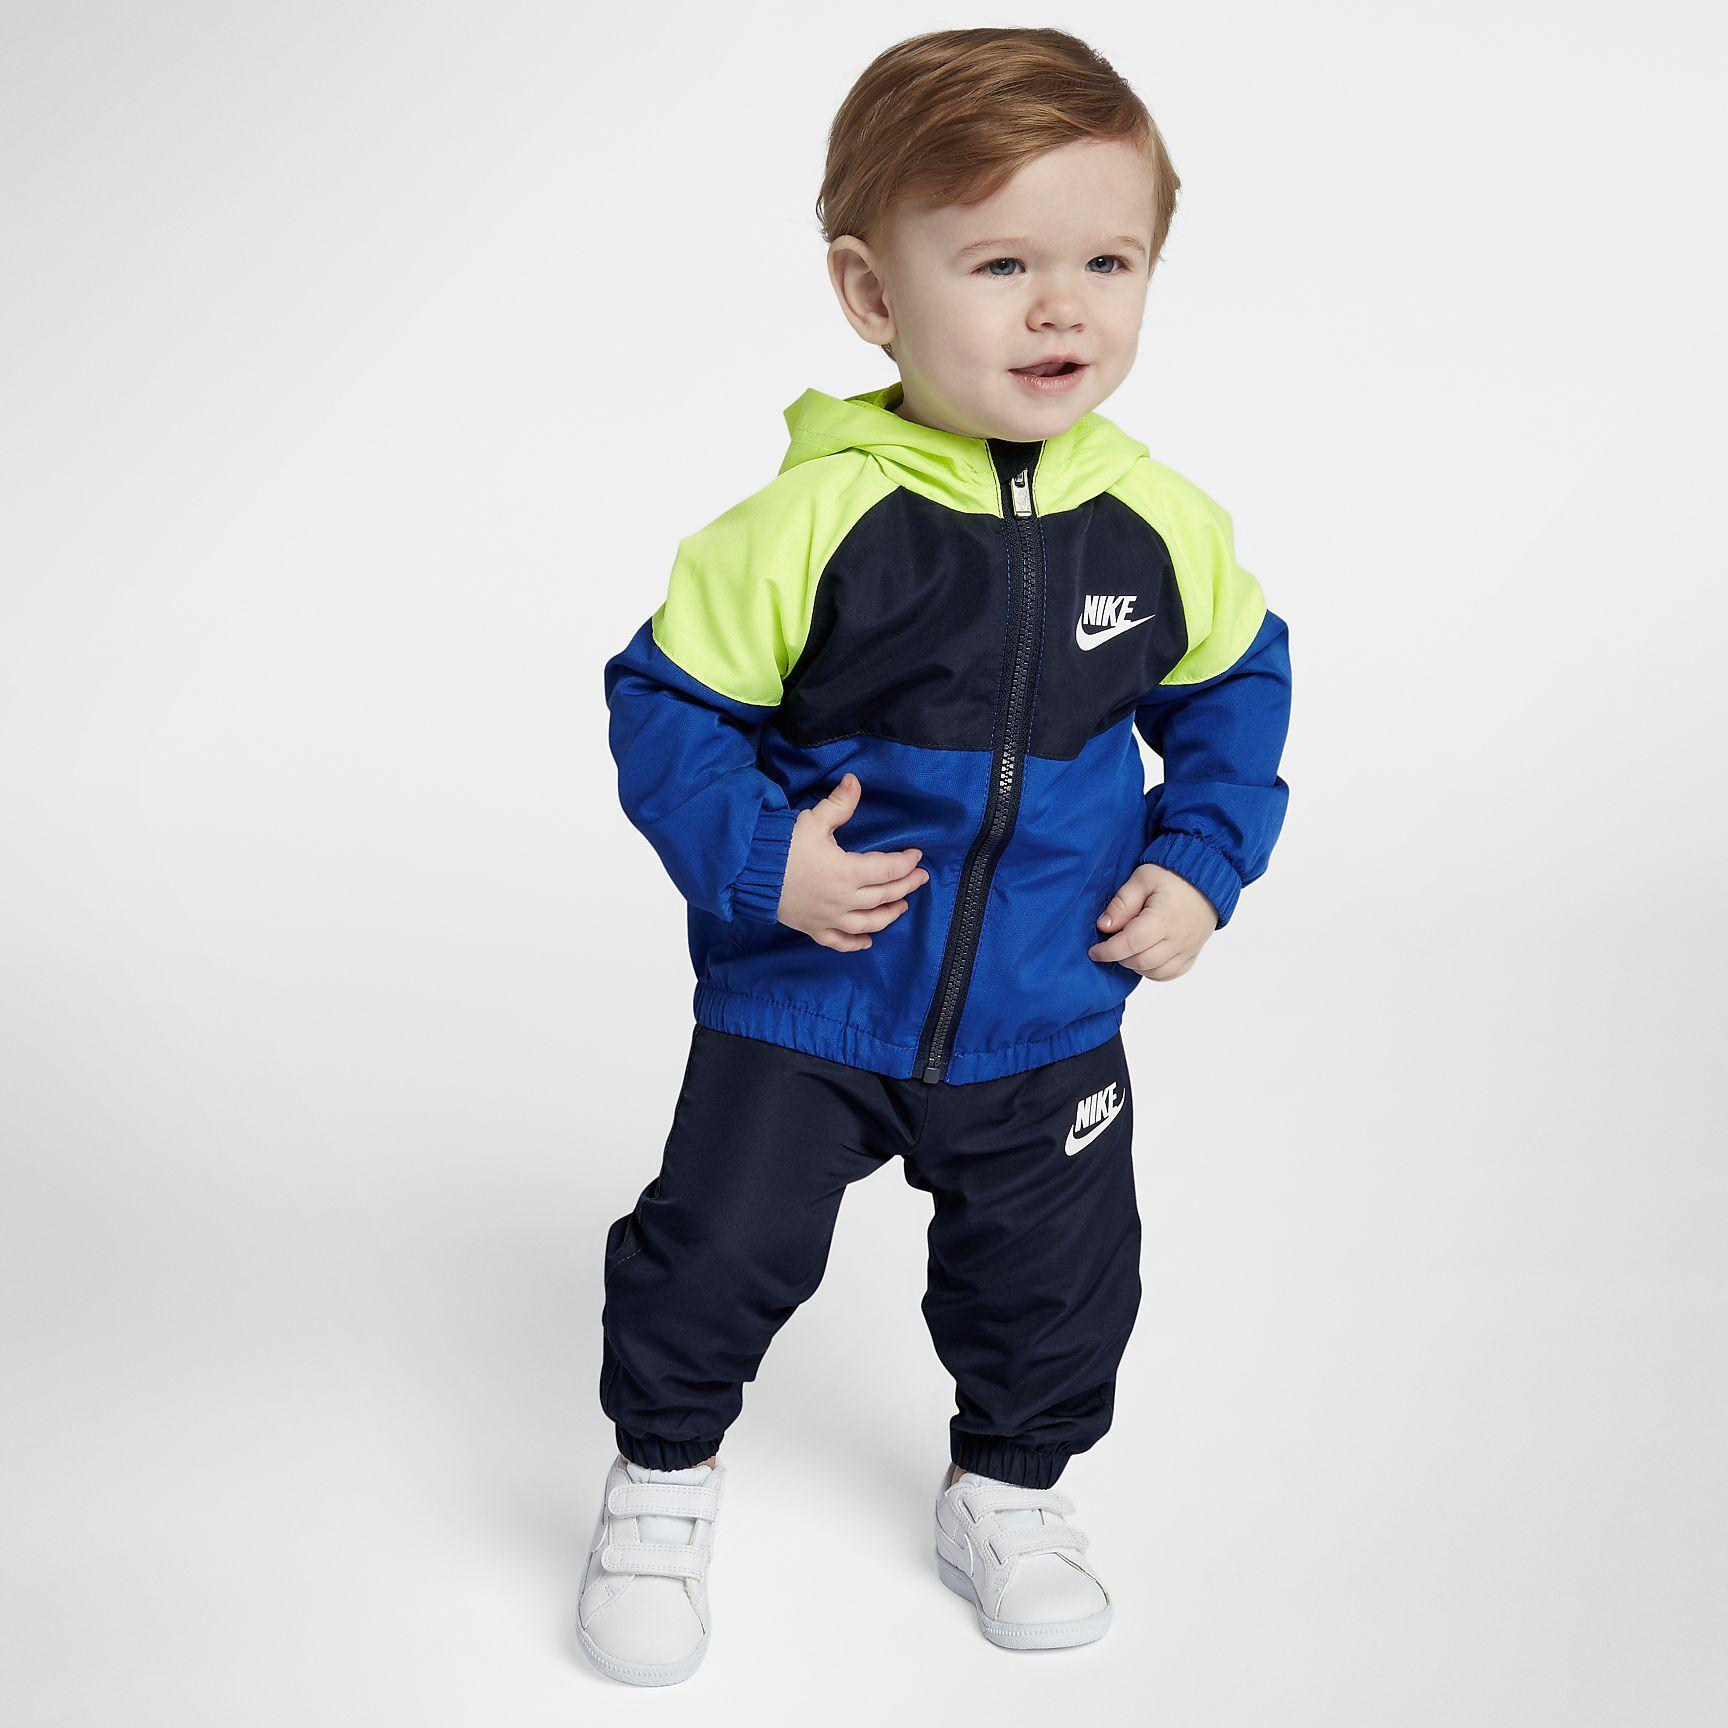 Nike Futura Two Piece Infant Set Ropa Para Niños Varones Atuendos Para Niños Ropa Para Niñas